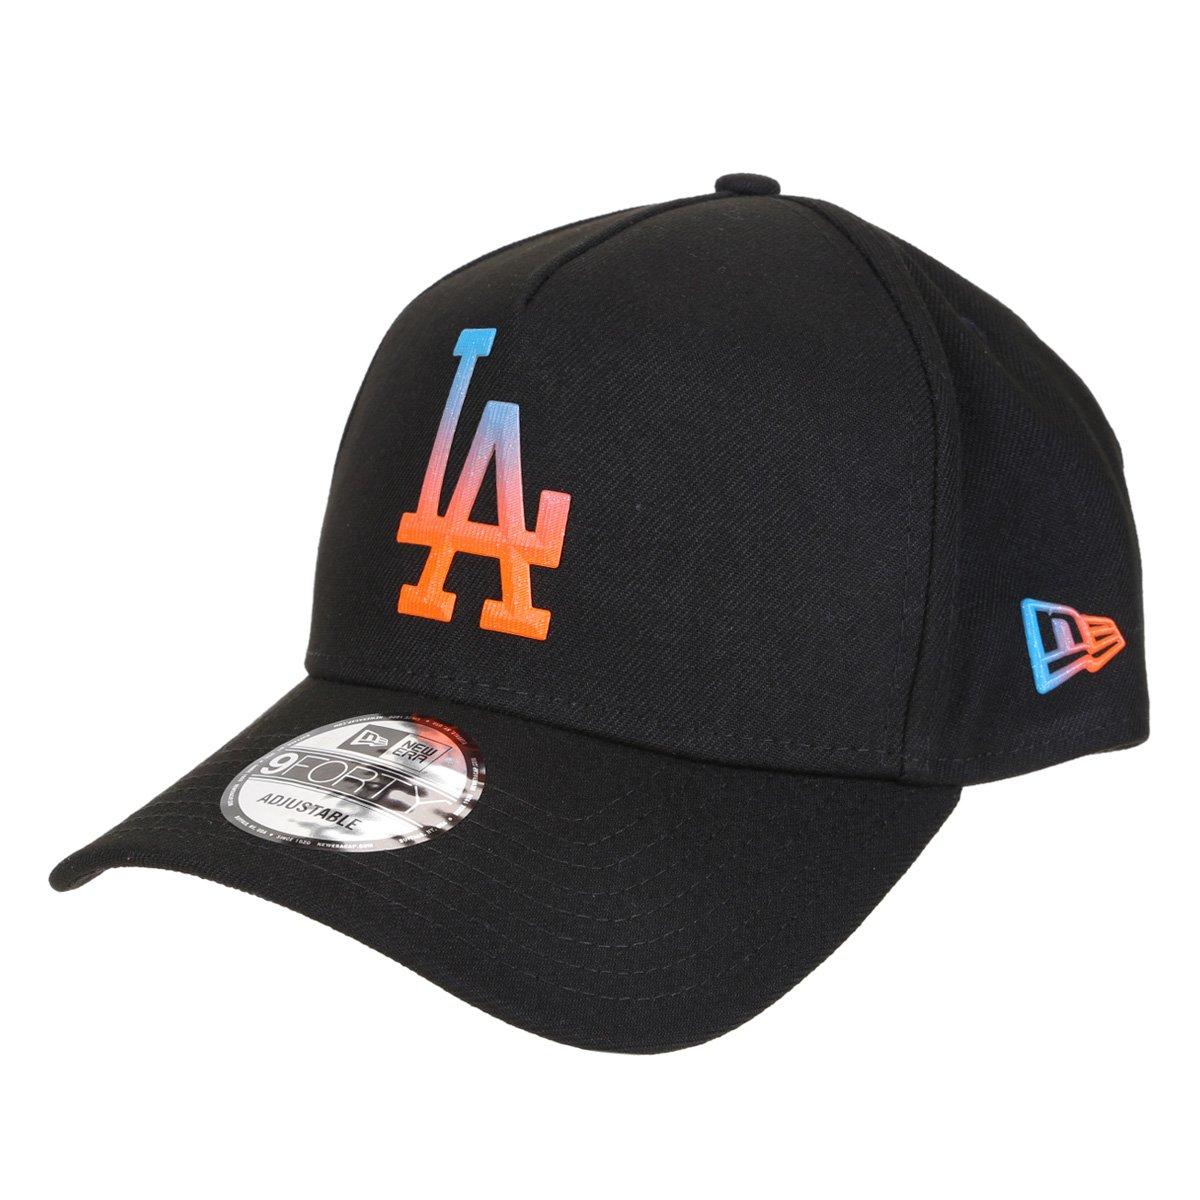 Boné New Era MLB Los Angeles Dodgers Aba Curva Snapback A-Frame Rave Space Gradiente 9Forty